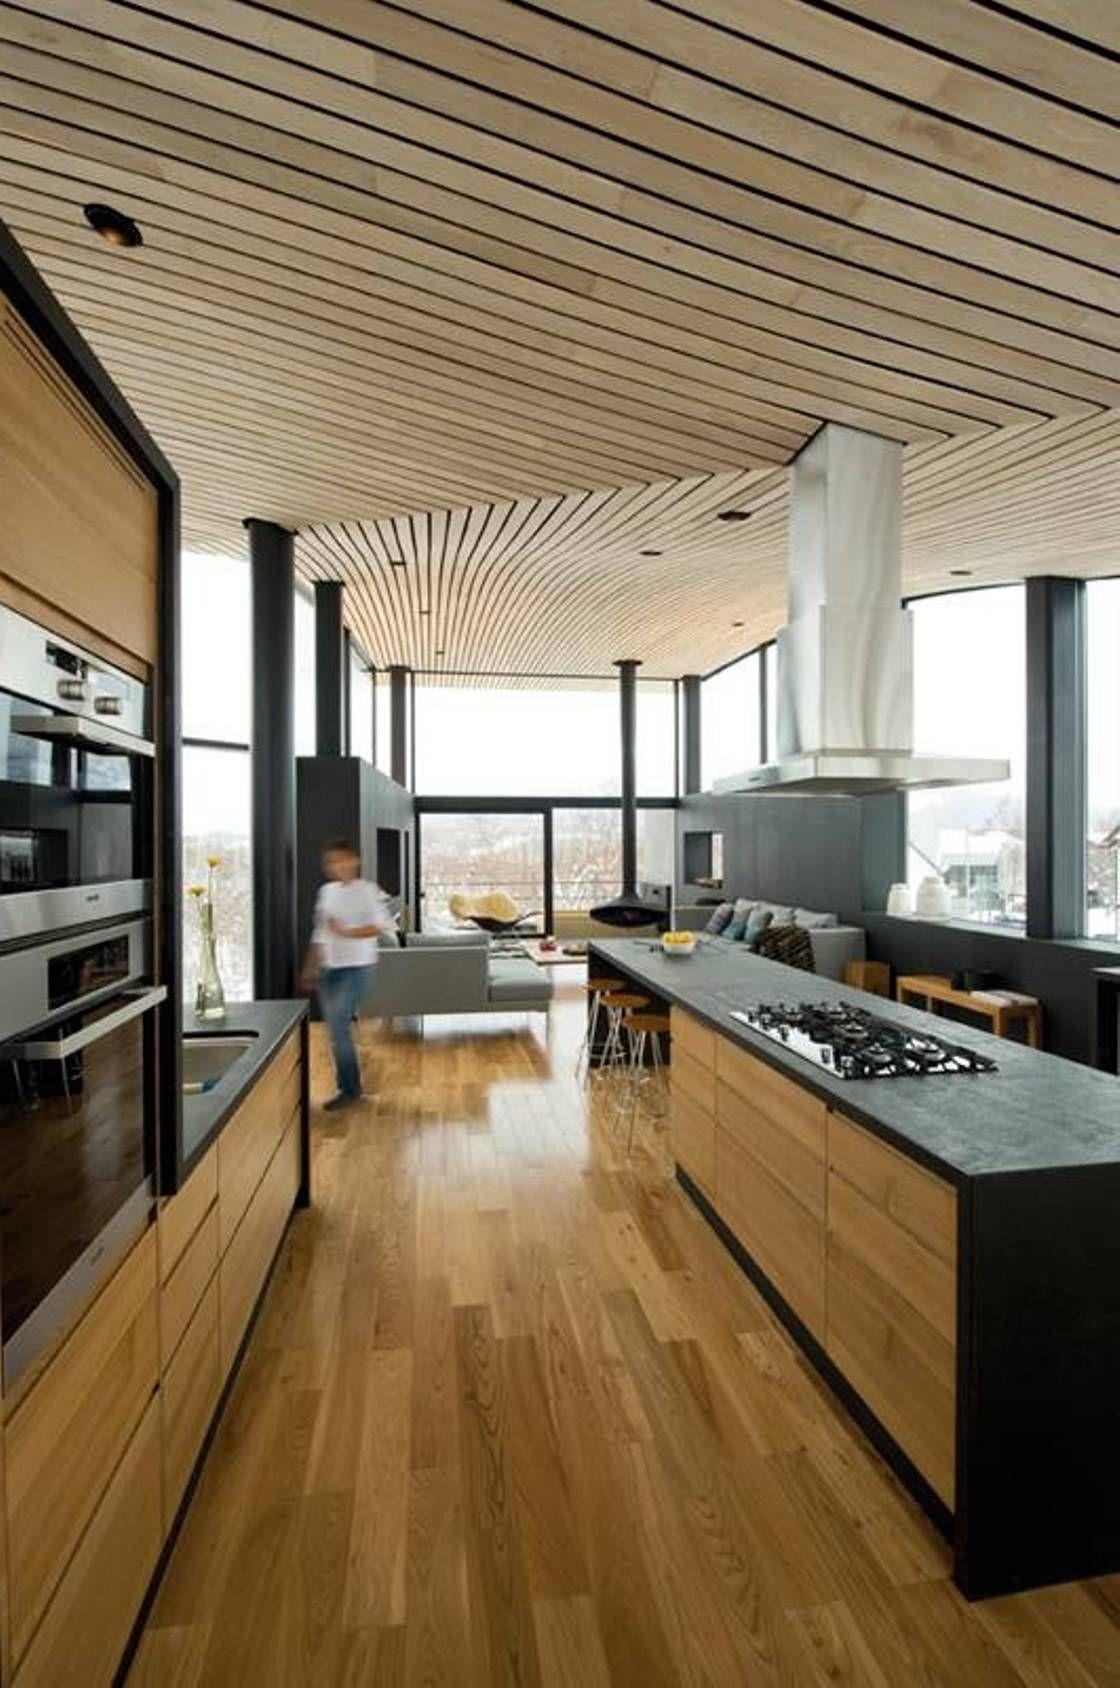 Awesome Modern Japanese Style Kitchen Idea Kitchen Styling